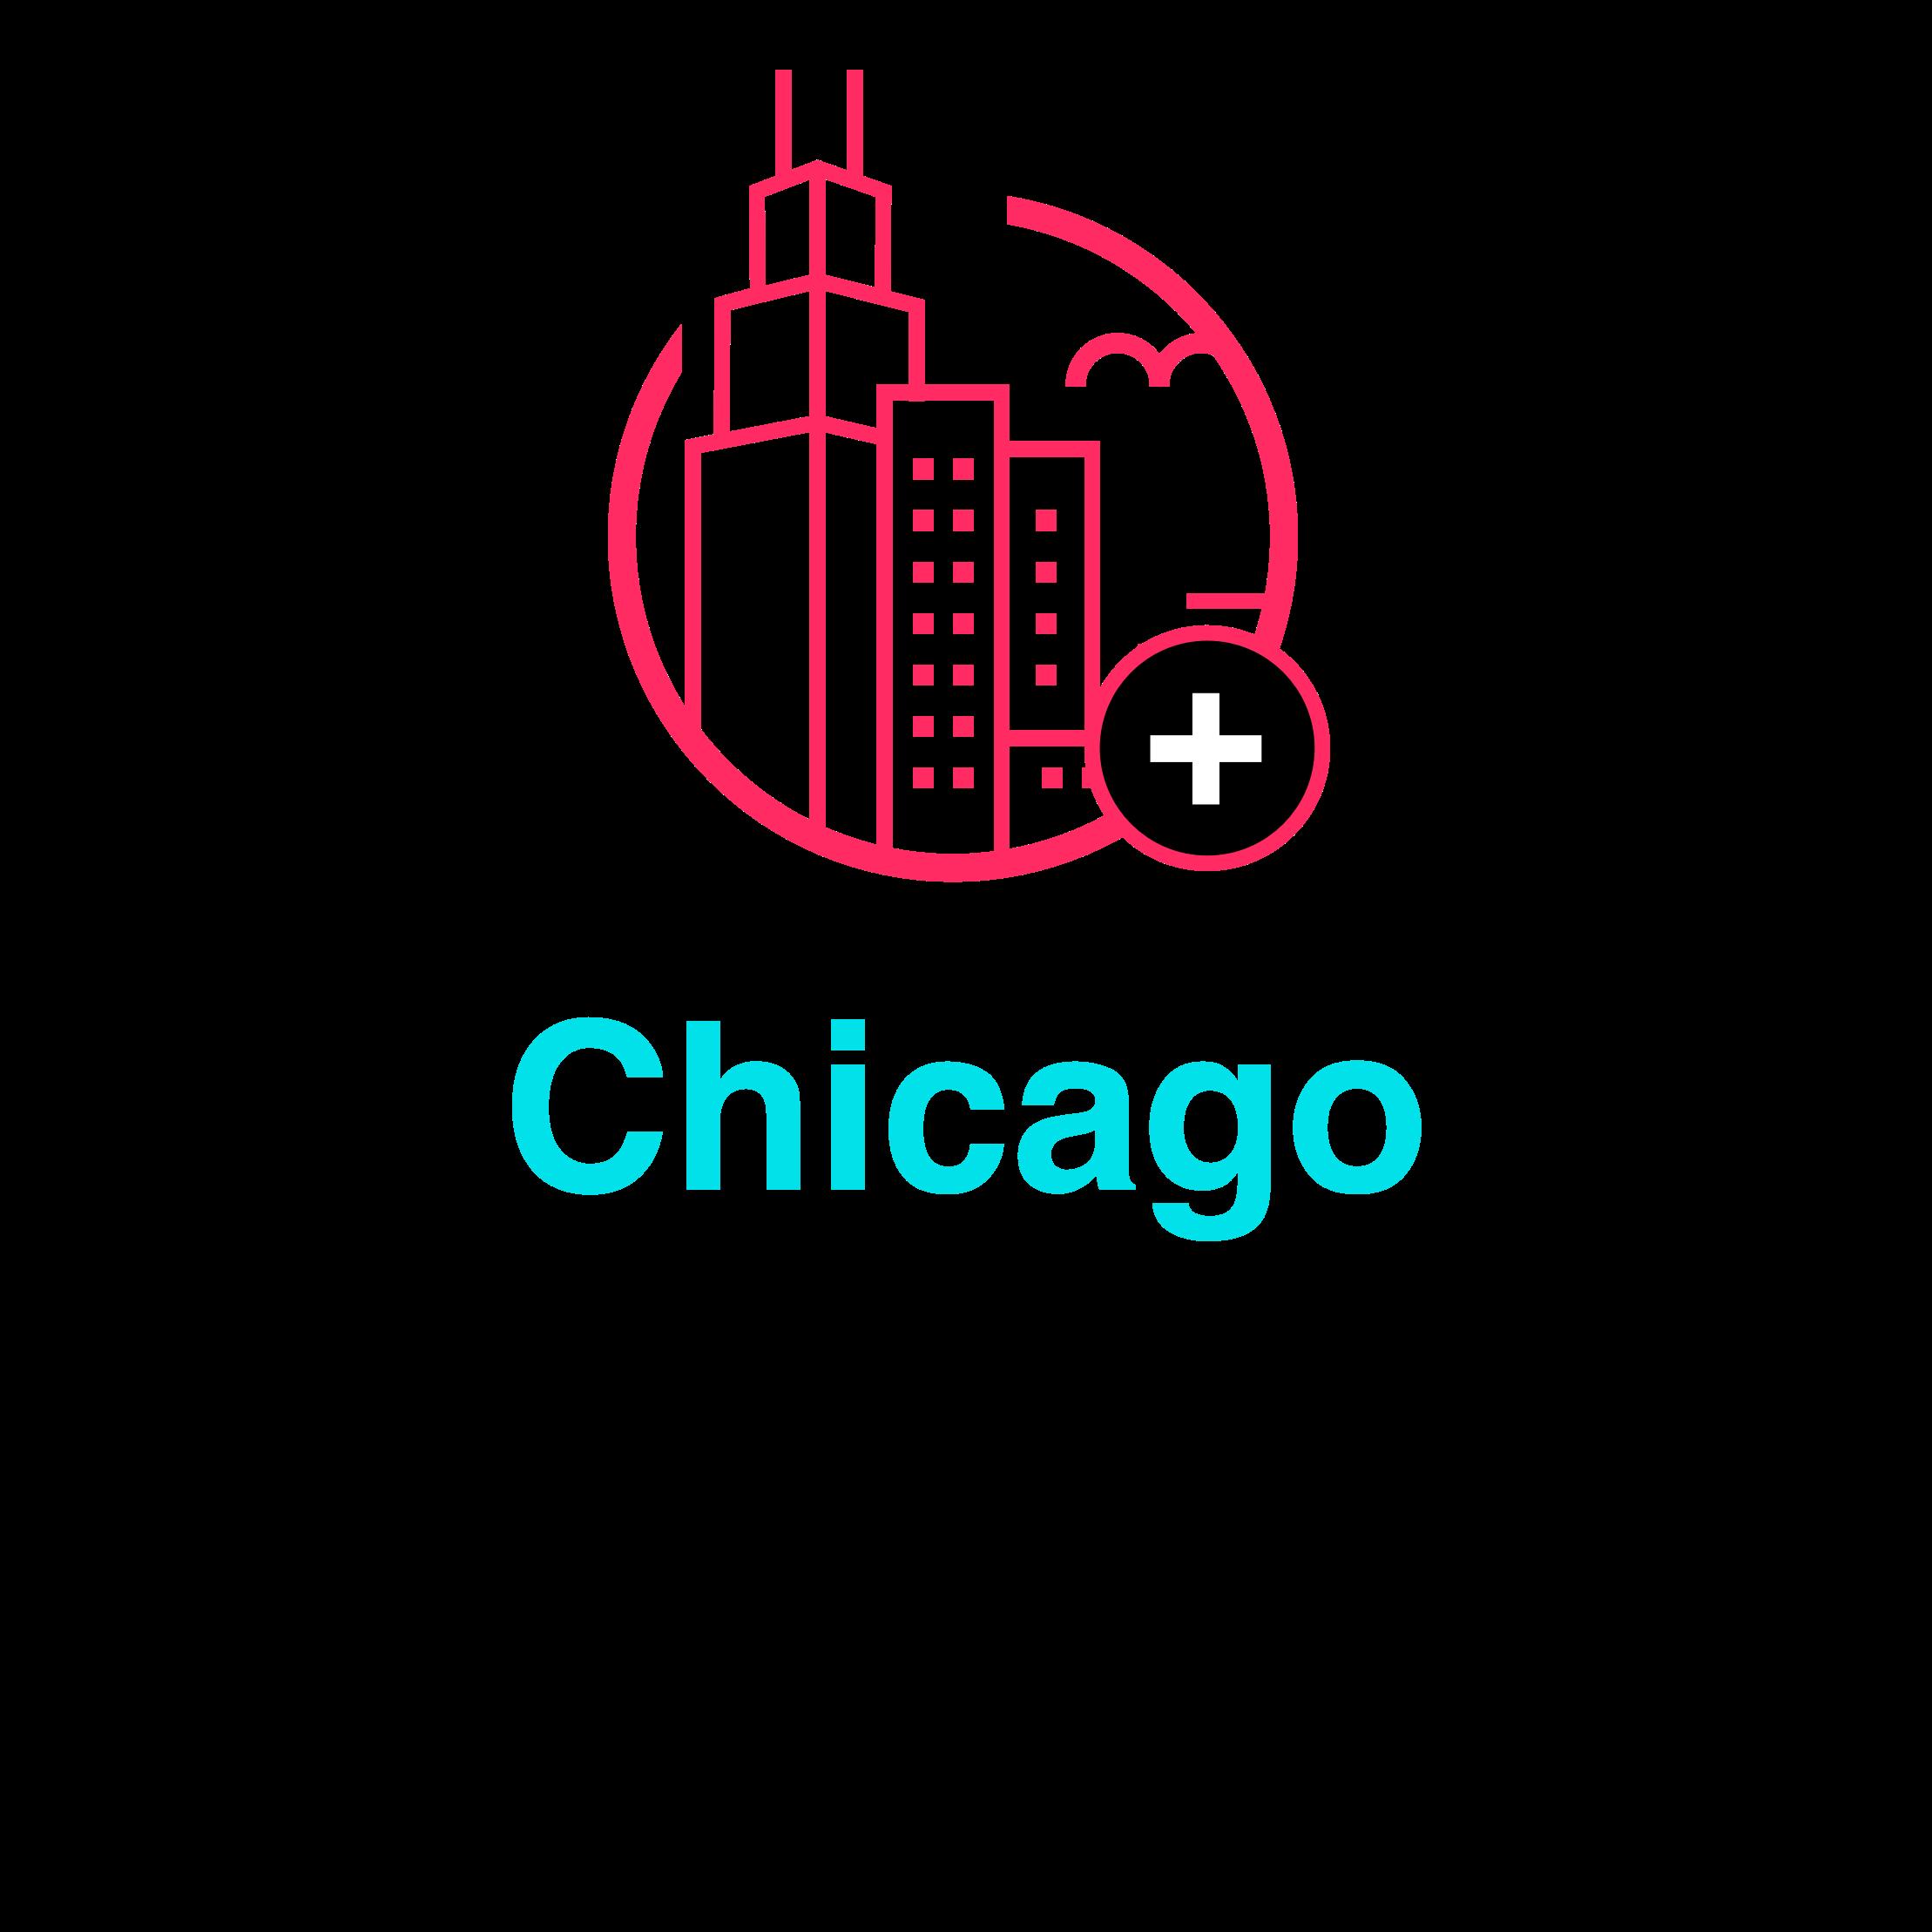 Chicago1-1109 Copy